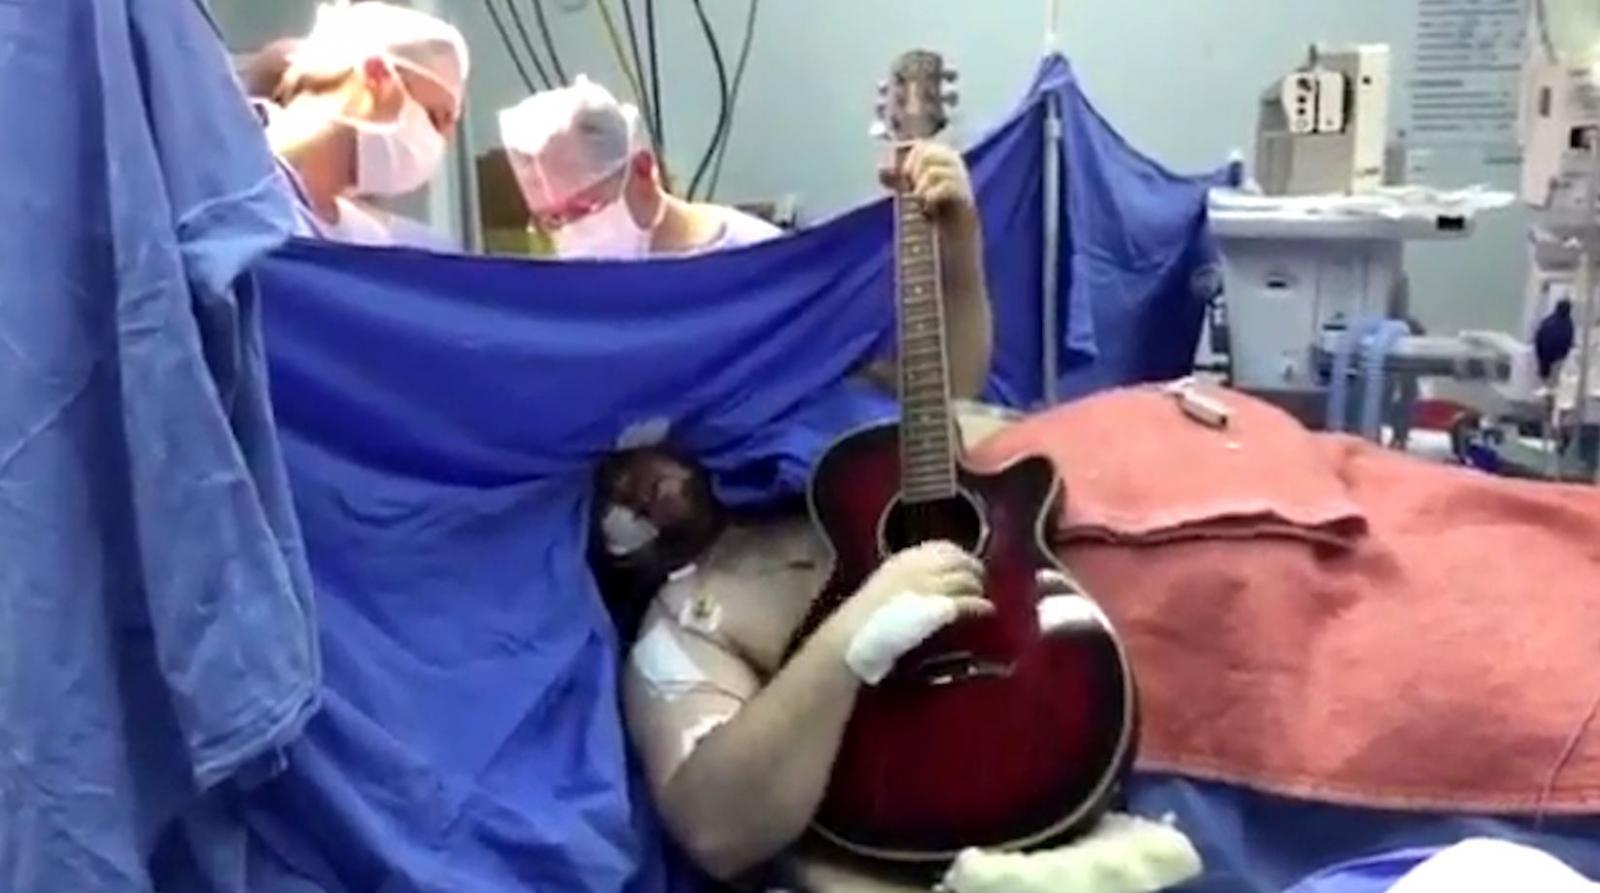 Brazilian guitarist plays during operation